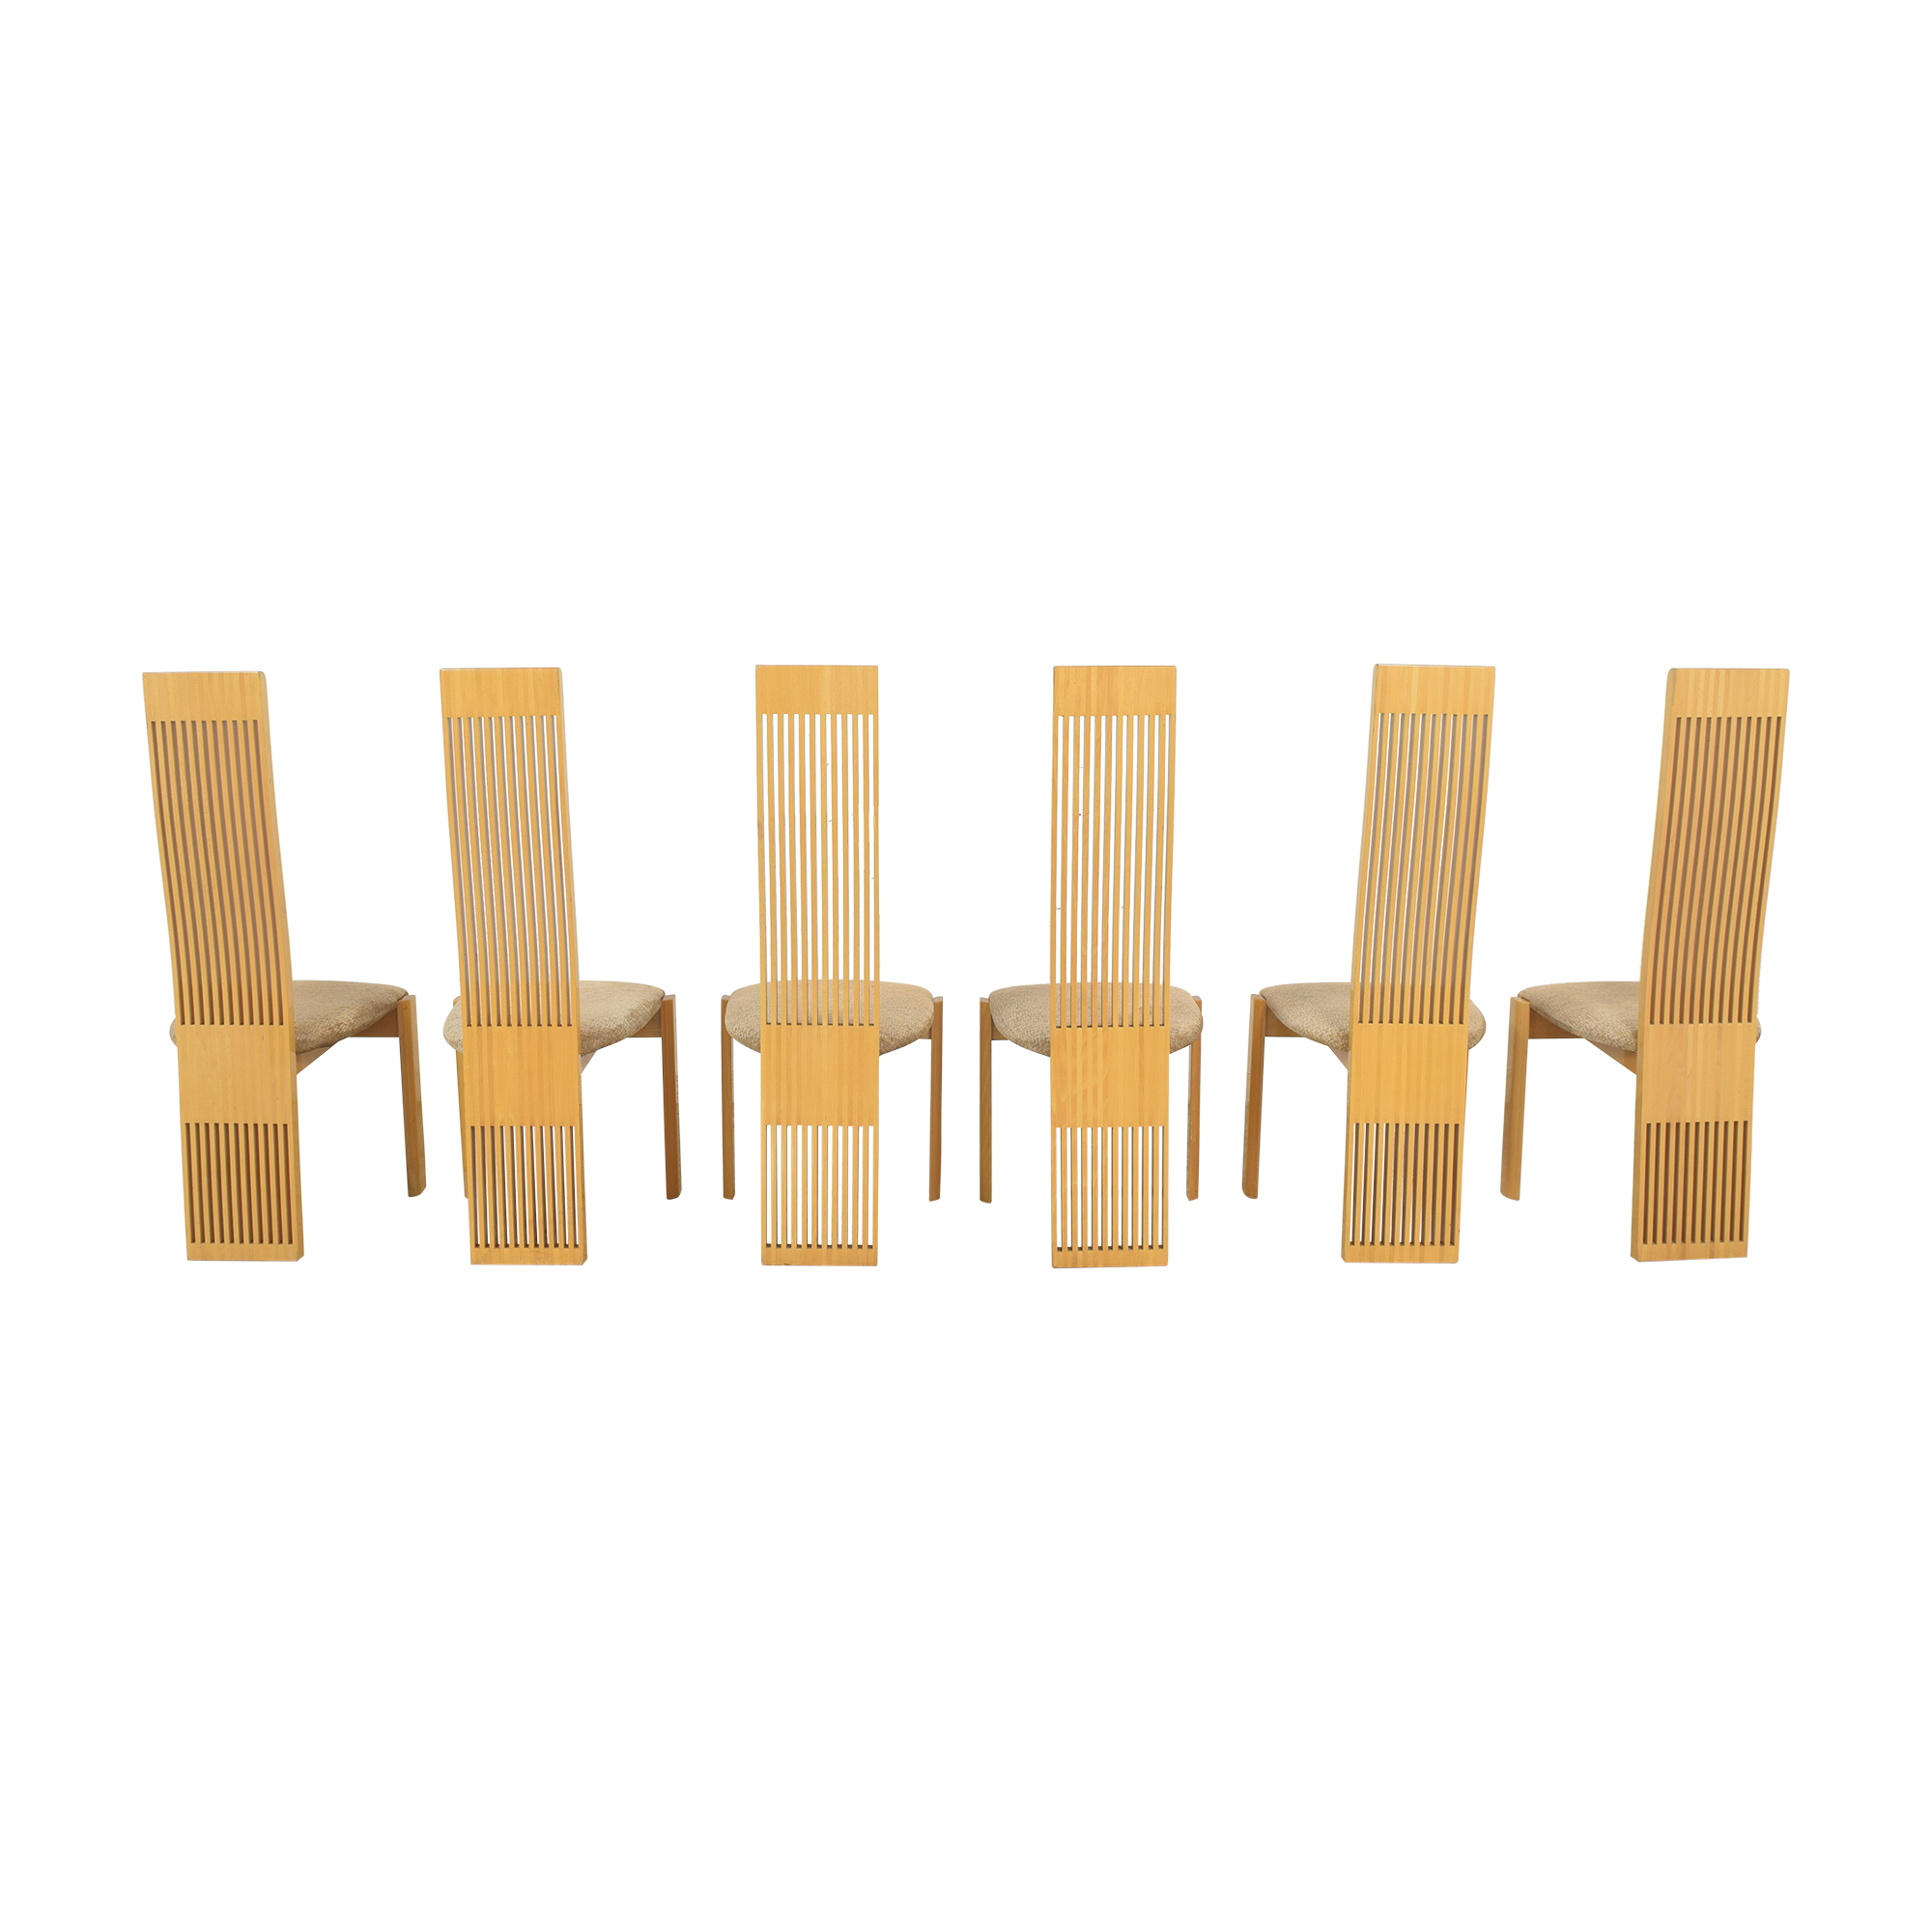 Pietro Costantini Pietro Costantini High Back Dining Chairs used